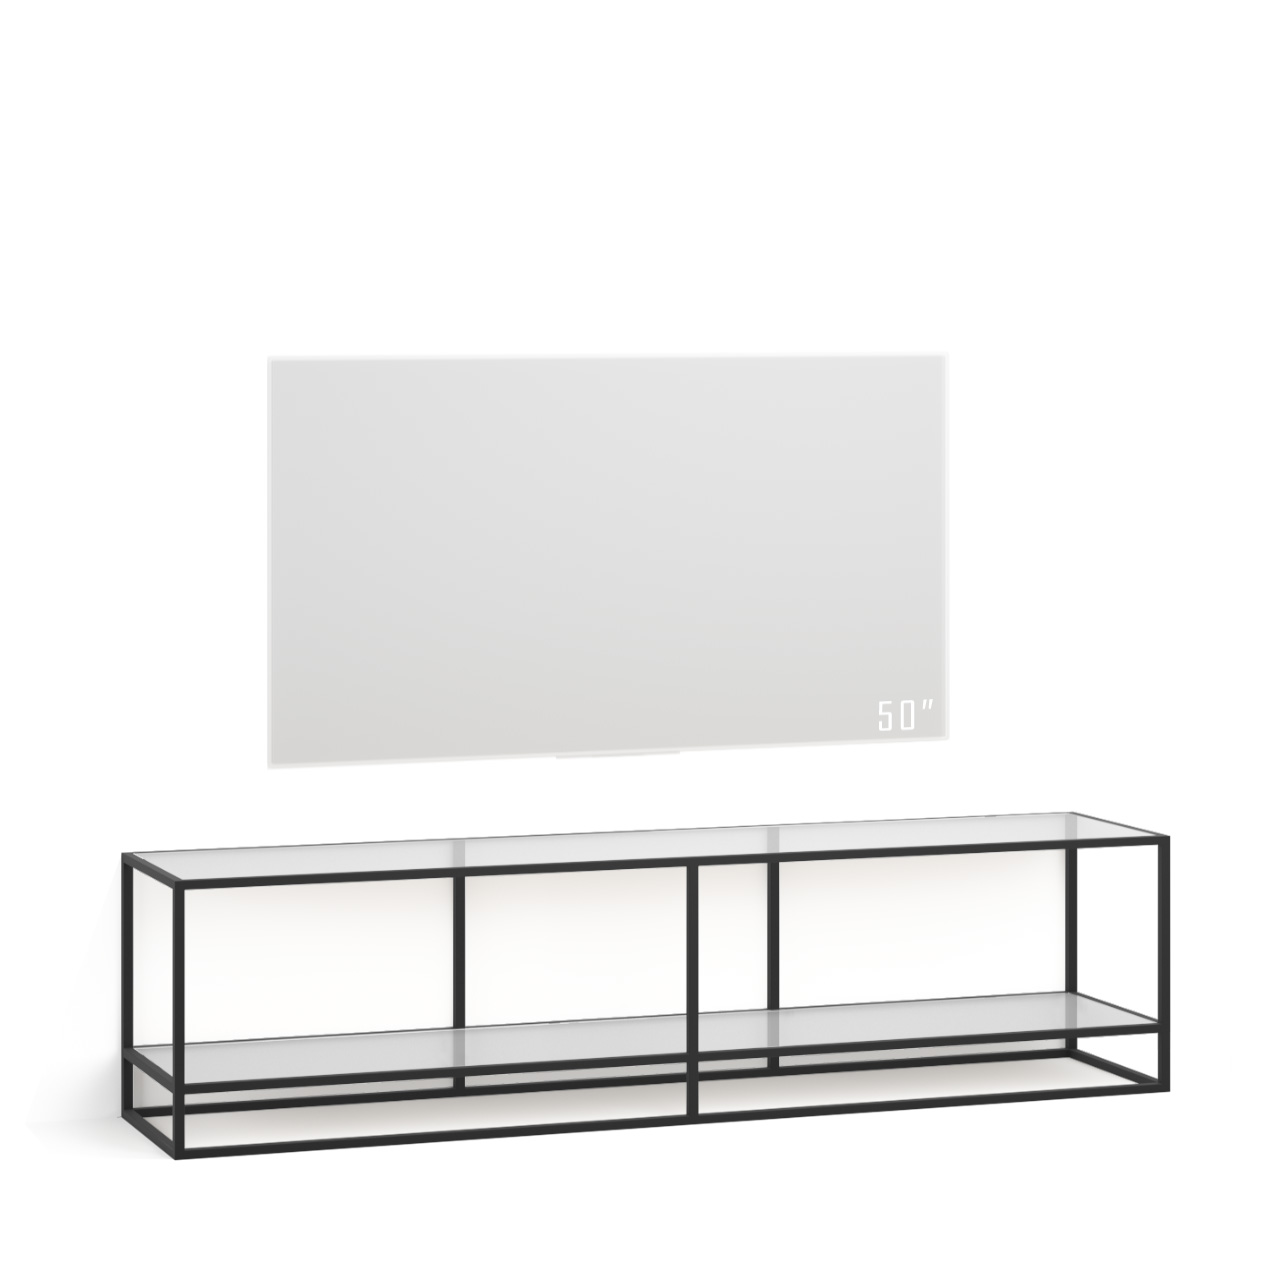 Тумба tv Stand Lite Black со стеклянными полками